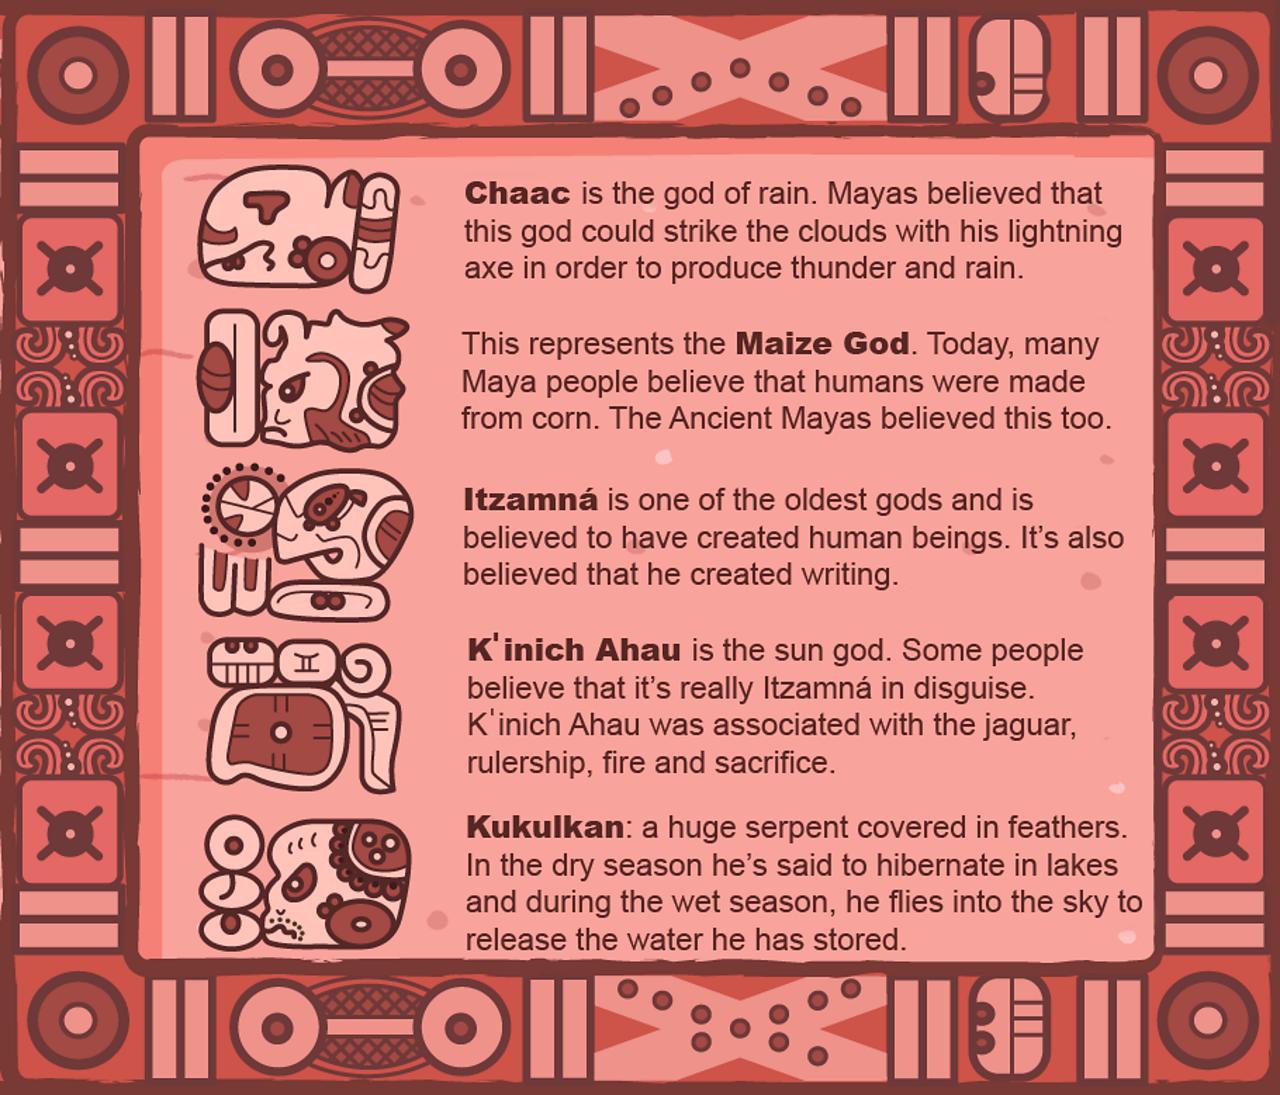 Chaac is the god of rain. The Maize God created maize. Itzamna created humans. Kinich-Ahau is the Sun God. Kukulkan is the Serpent God.